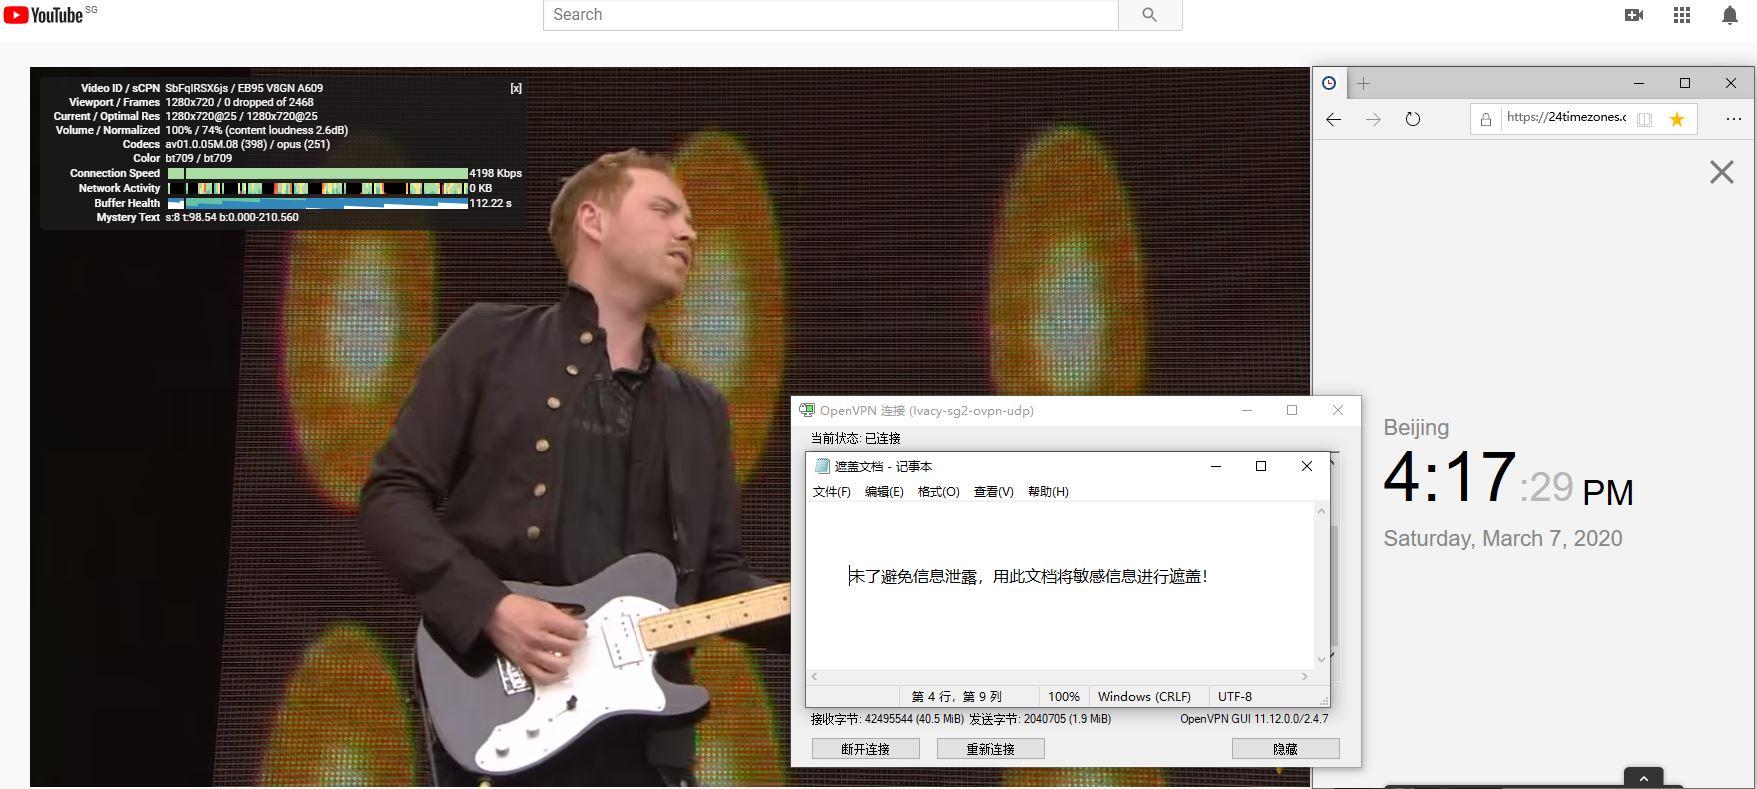 Windows10 IvacyVPN OpenVPN SG2 中国VPN翻墙 科学上网 Youtube测速 - 20200307